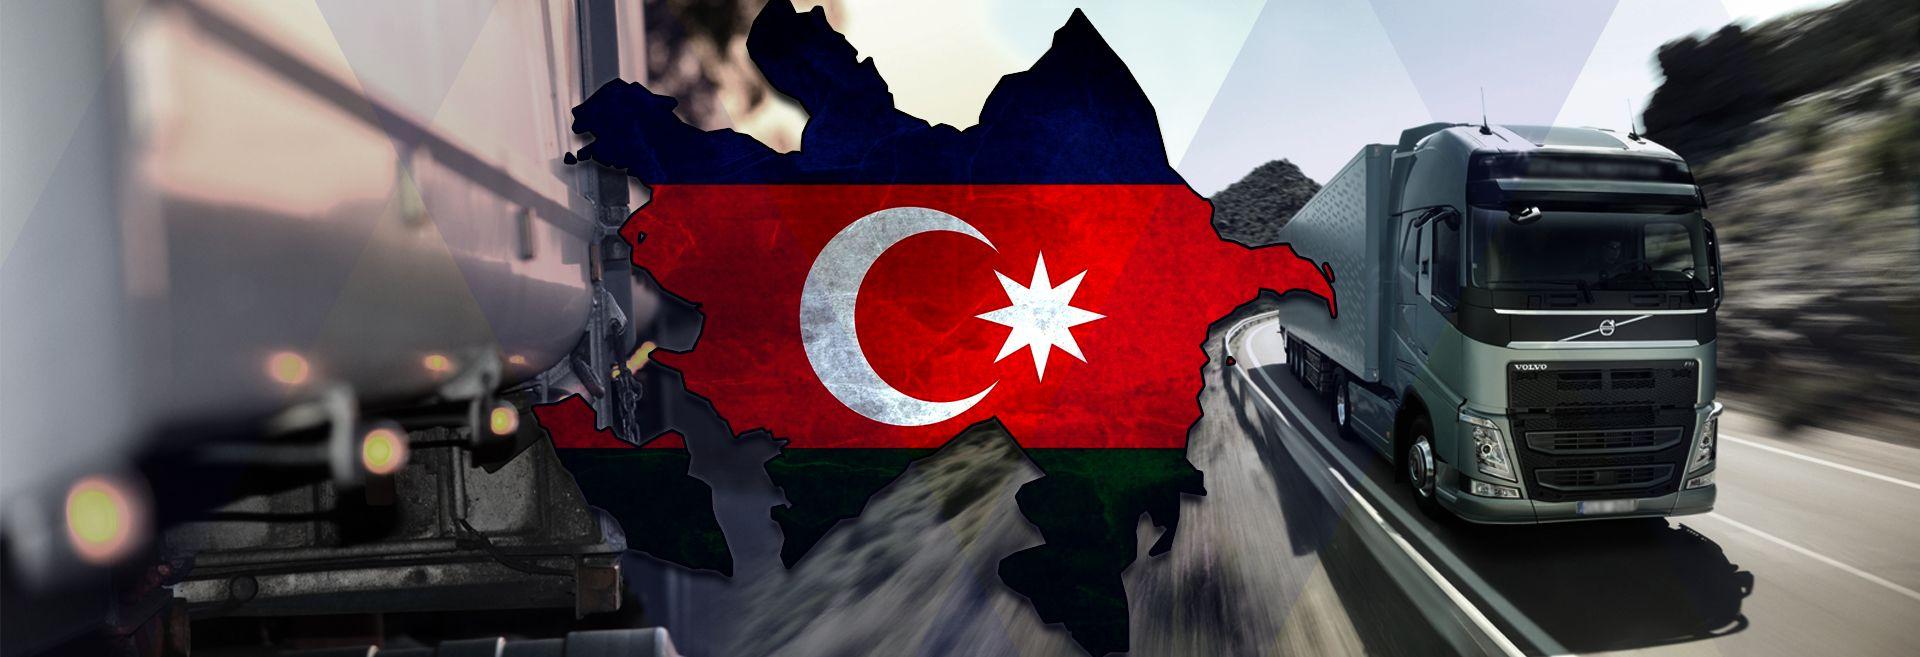 Azerbaycan Nakliyat